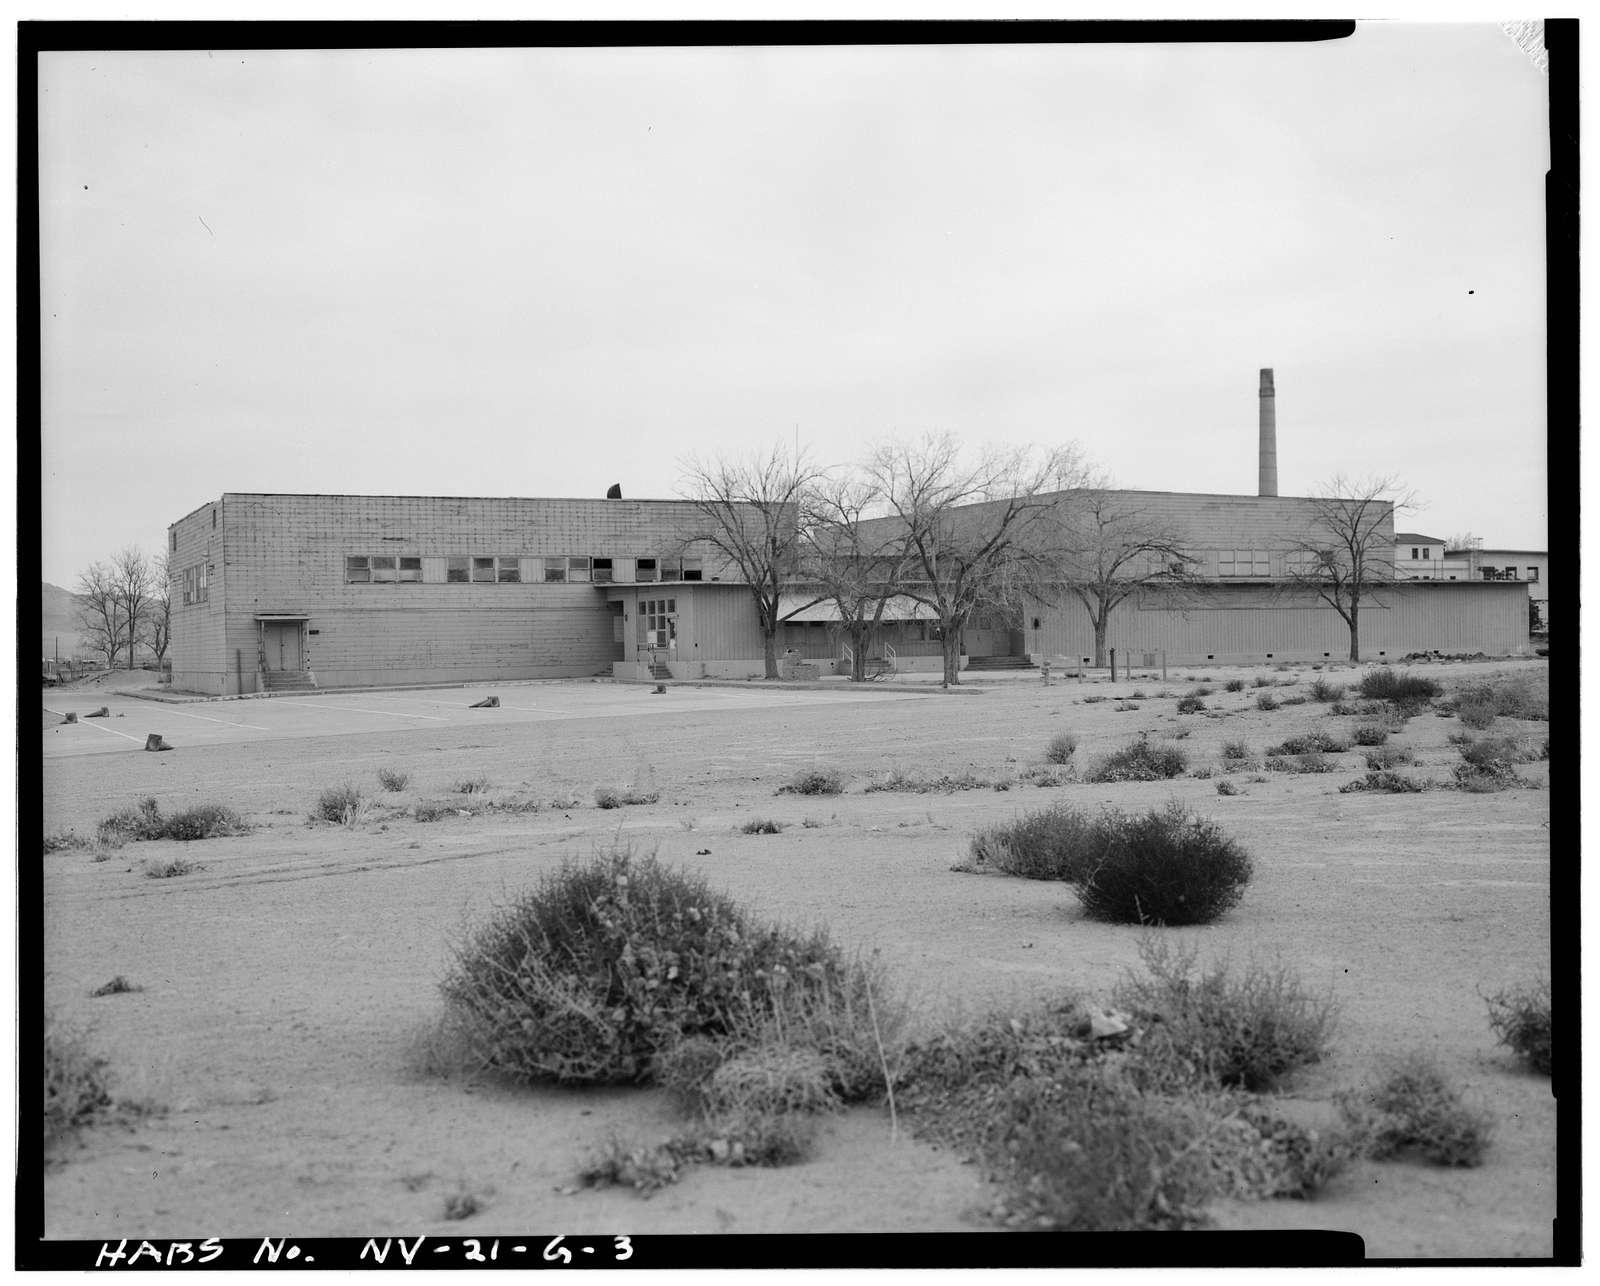 Hawthorne Naval Ammunition Depot, Gymnasium, North Main Avenue, Industrial Area, Hawthorne Army Ammunition Plant, Hawthorne, Mineral County, NV